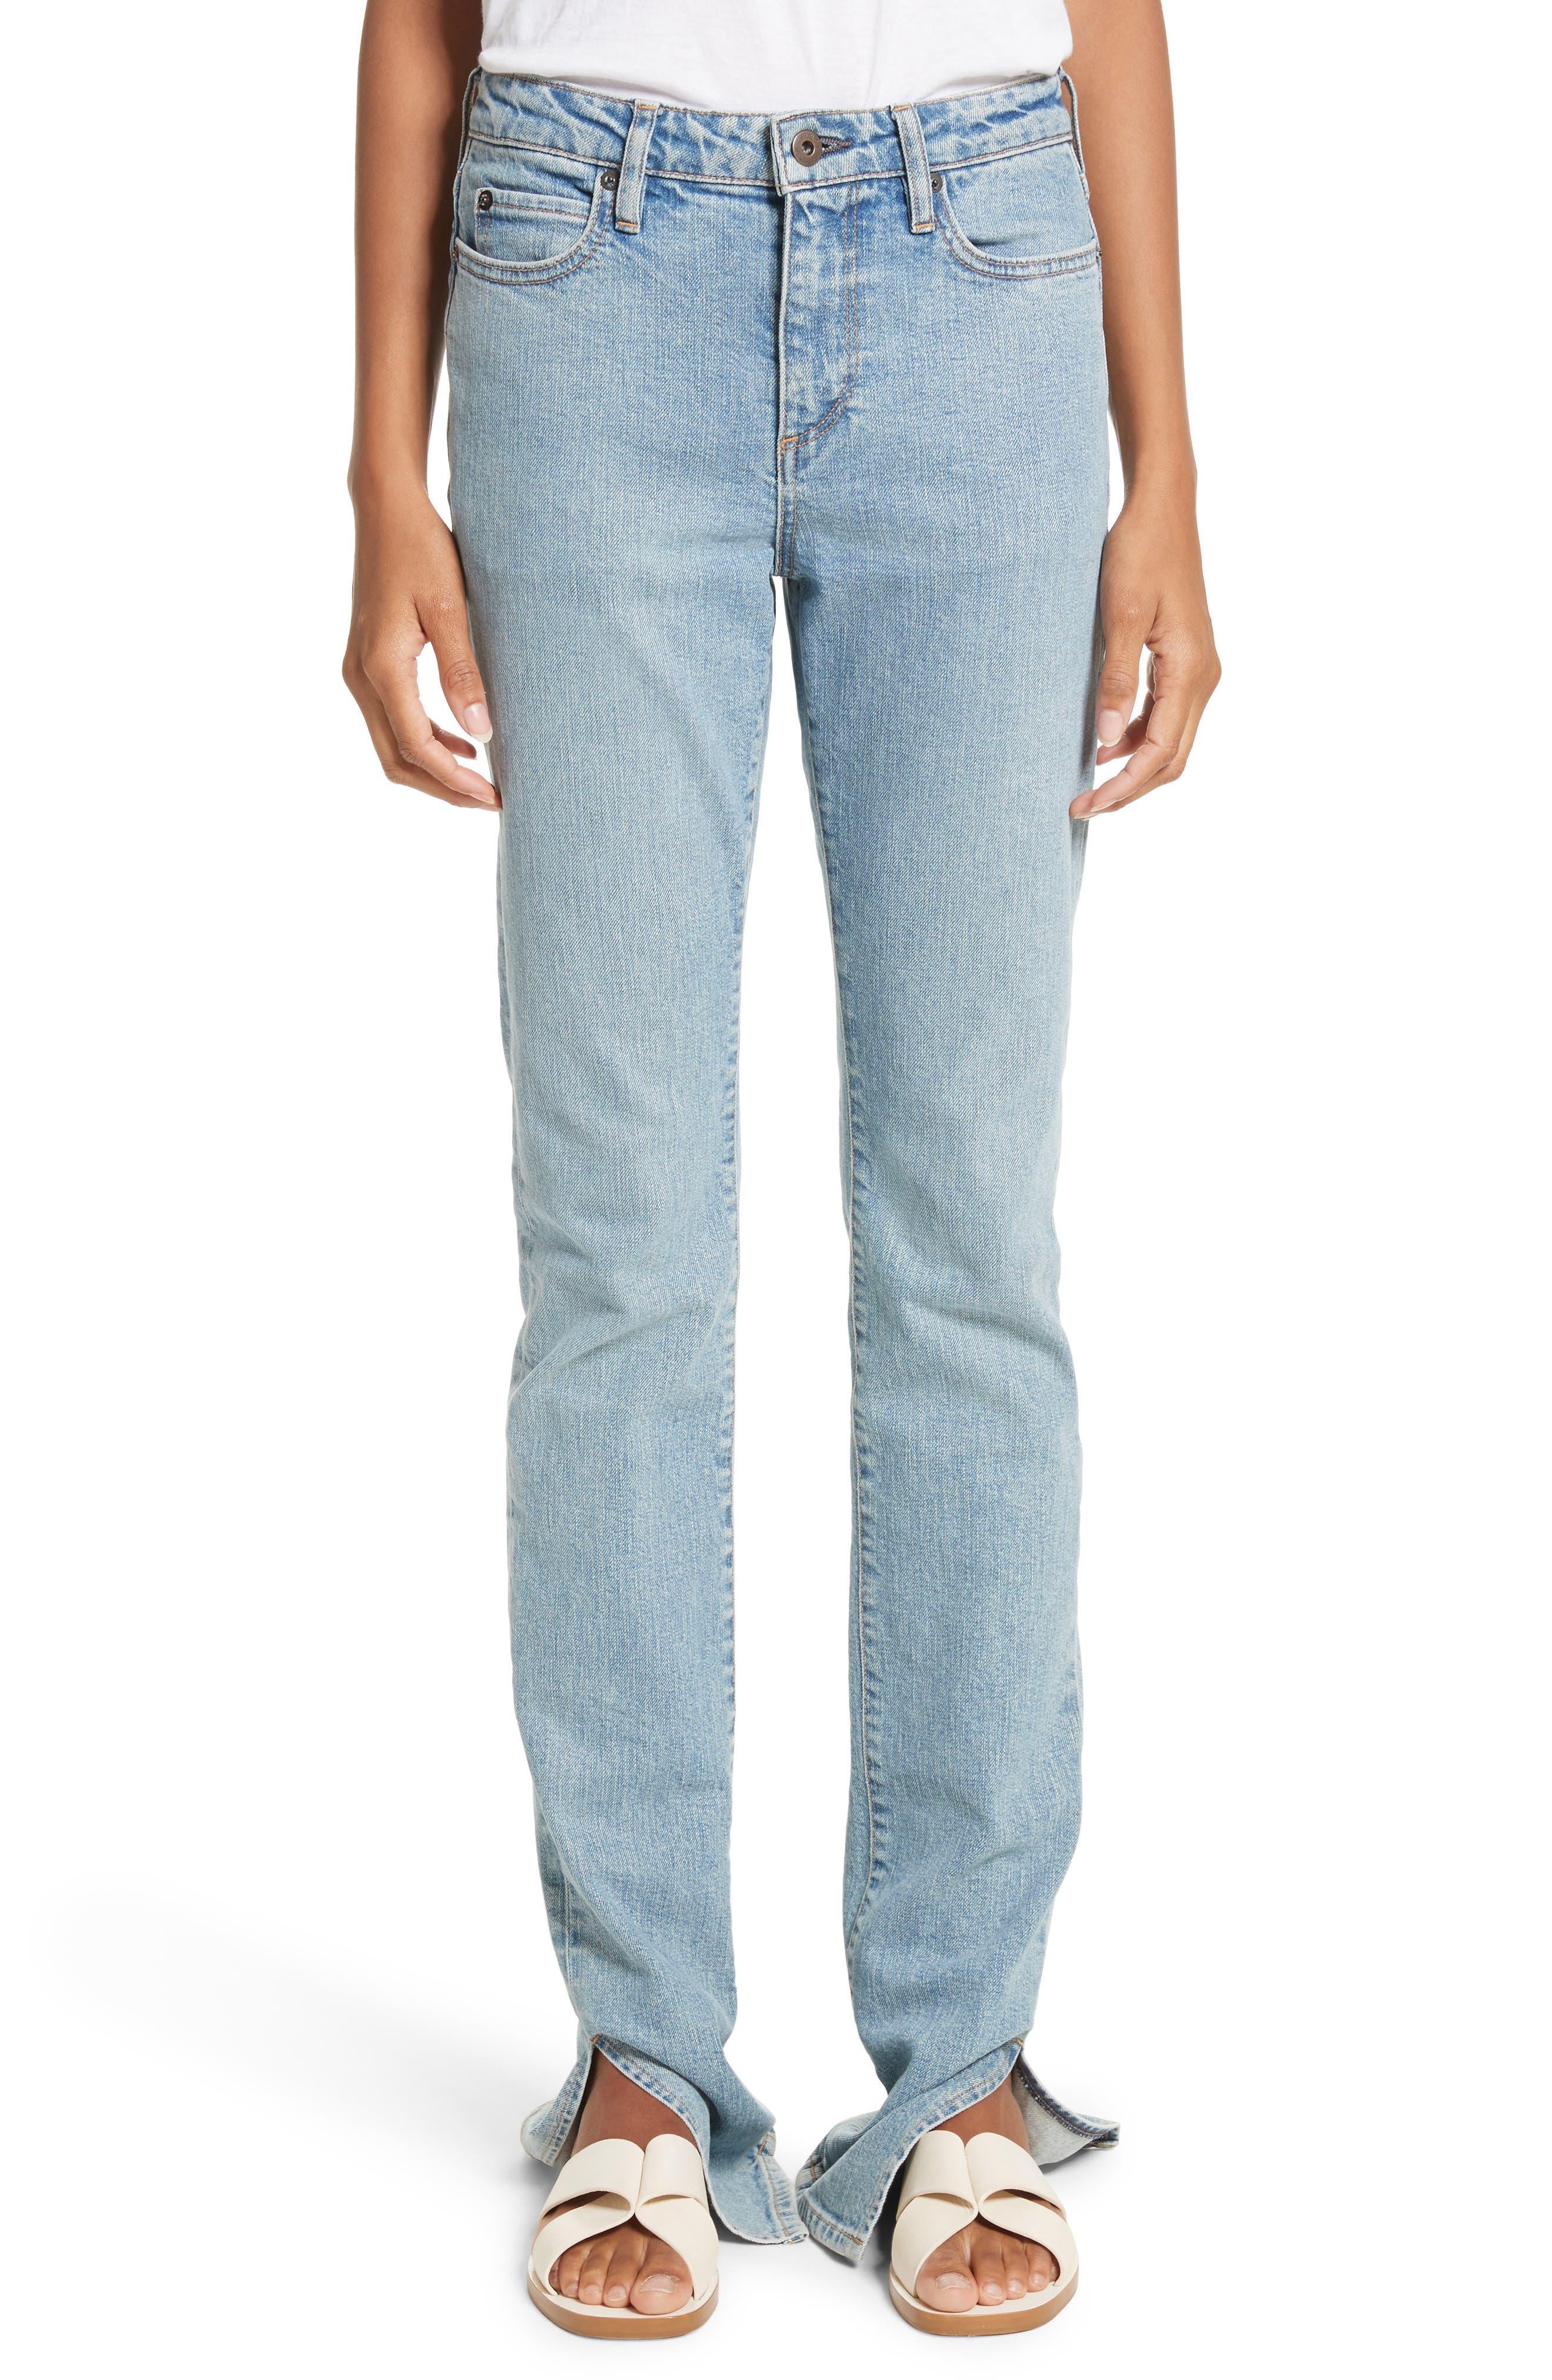 Simon Miller Lowry Split Hem Jeans